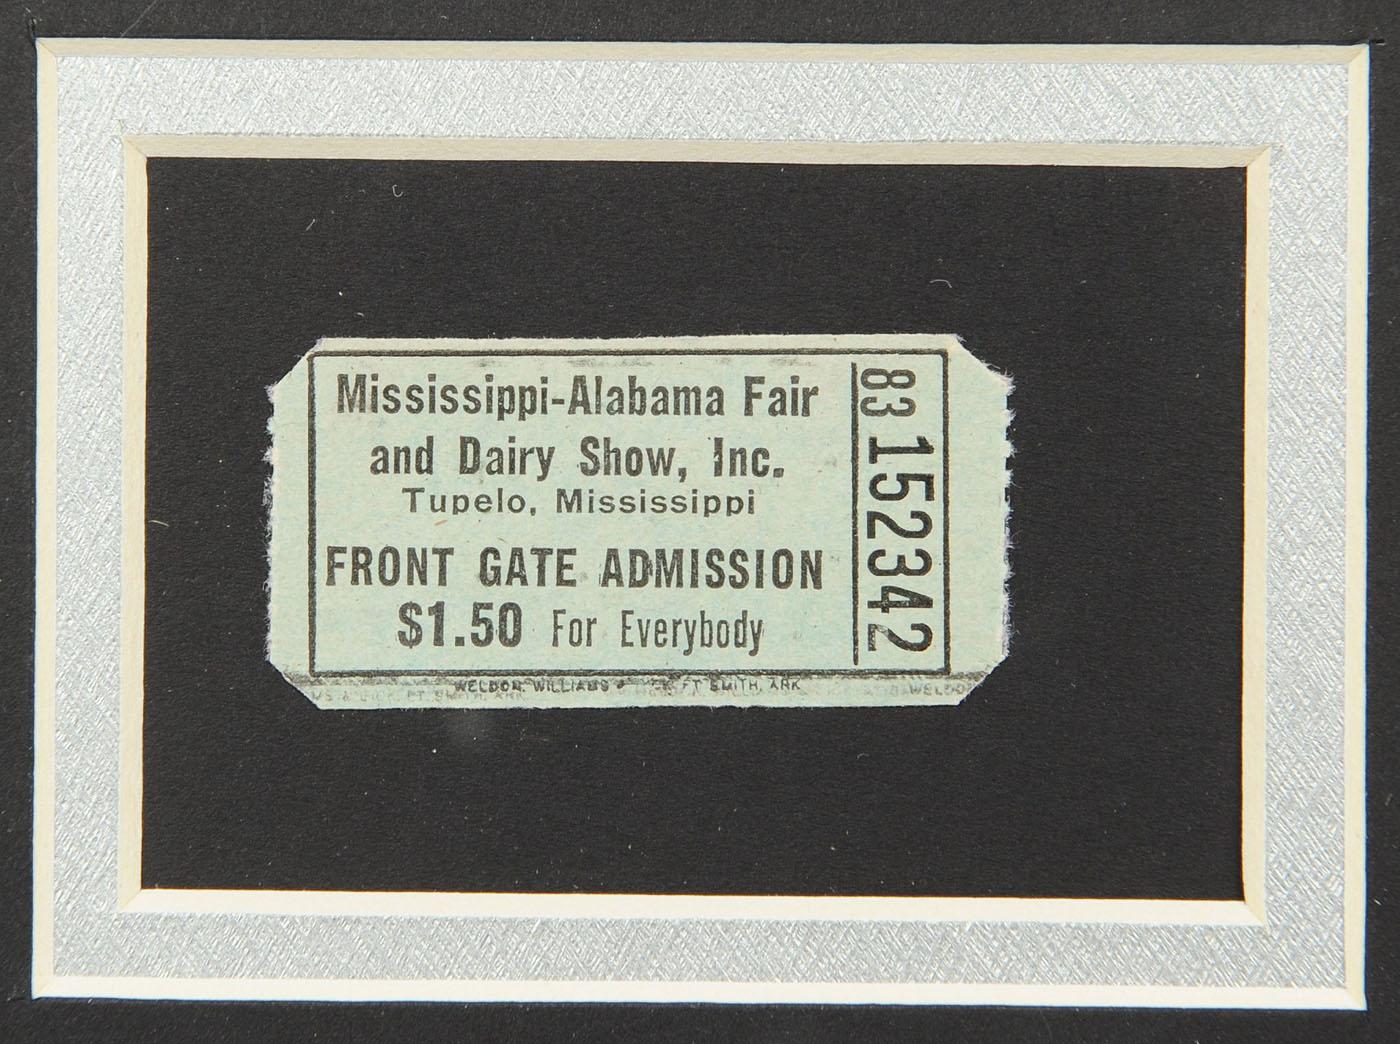 Lot 735: Elvis Presley Framed Concert Ticket & Memorabilia